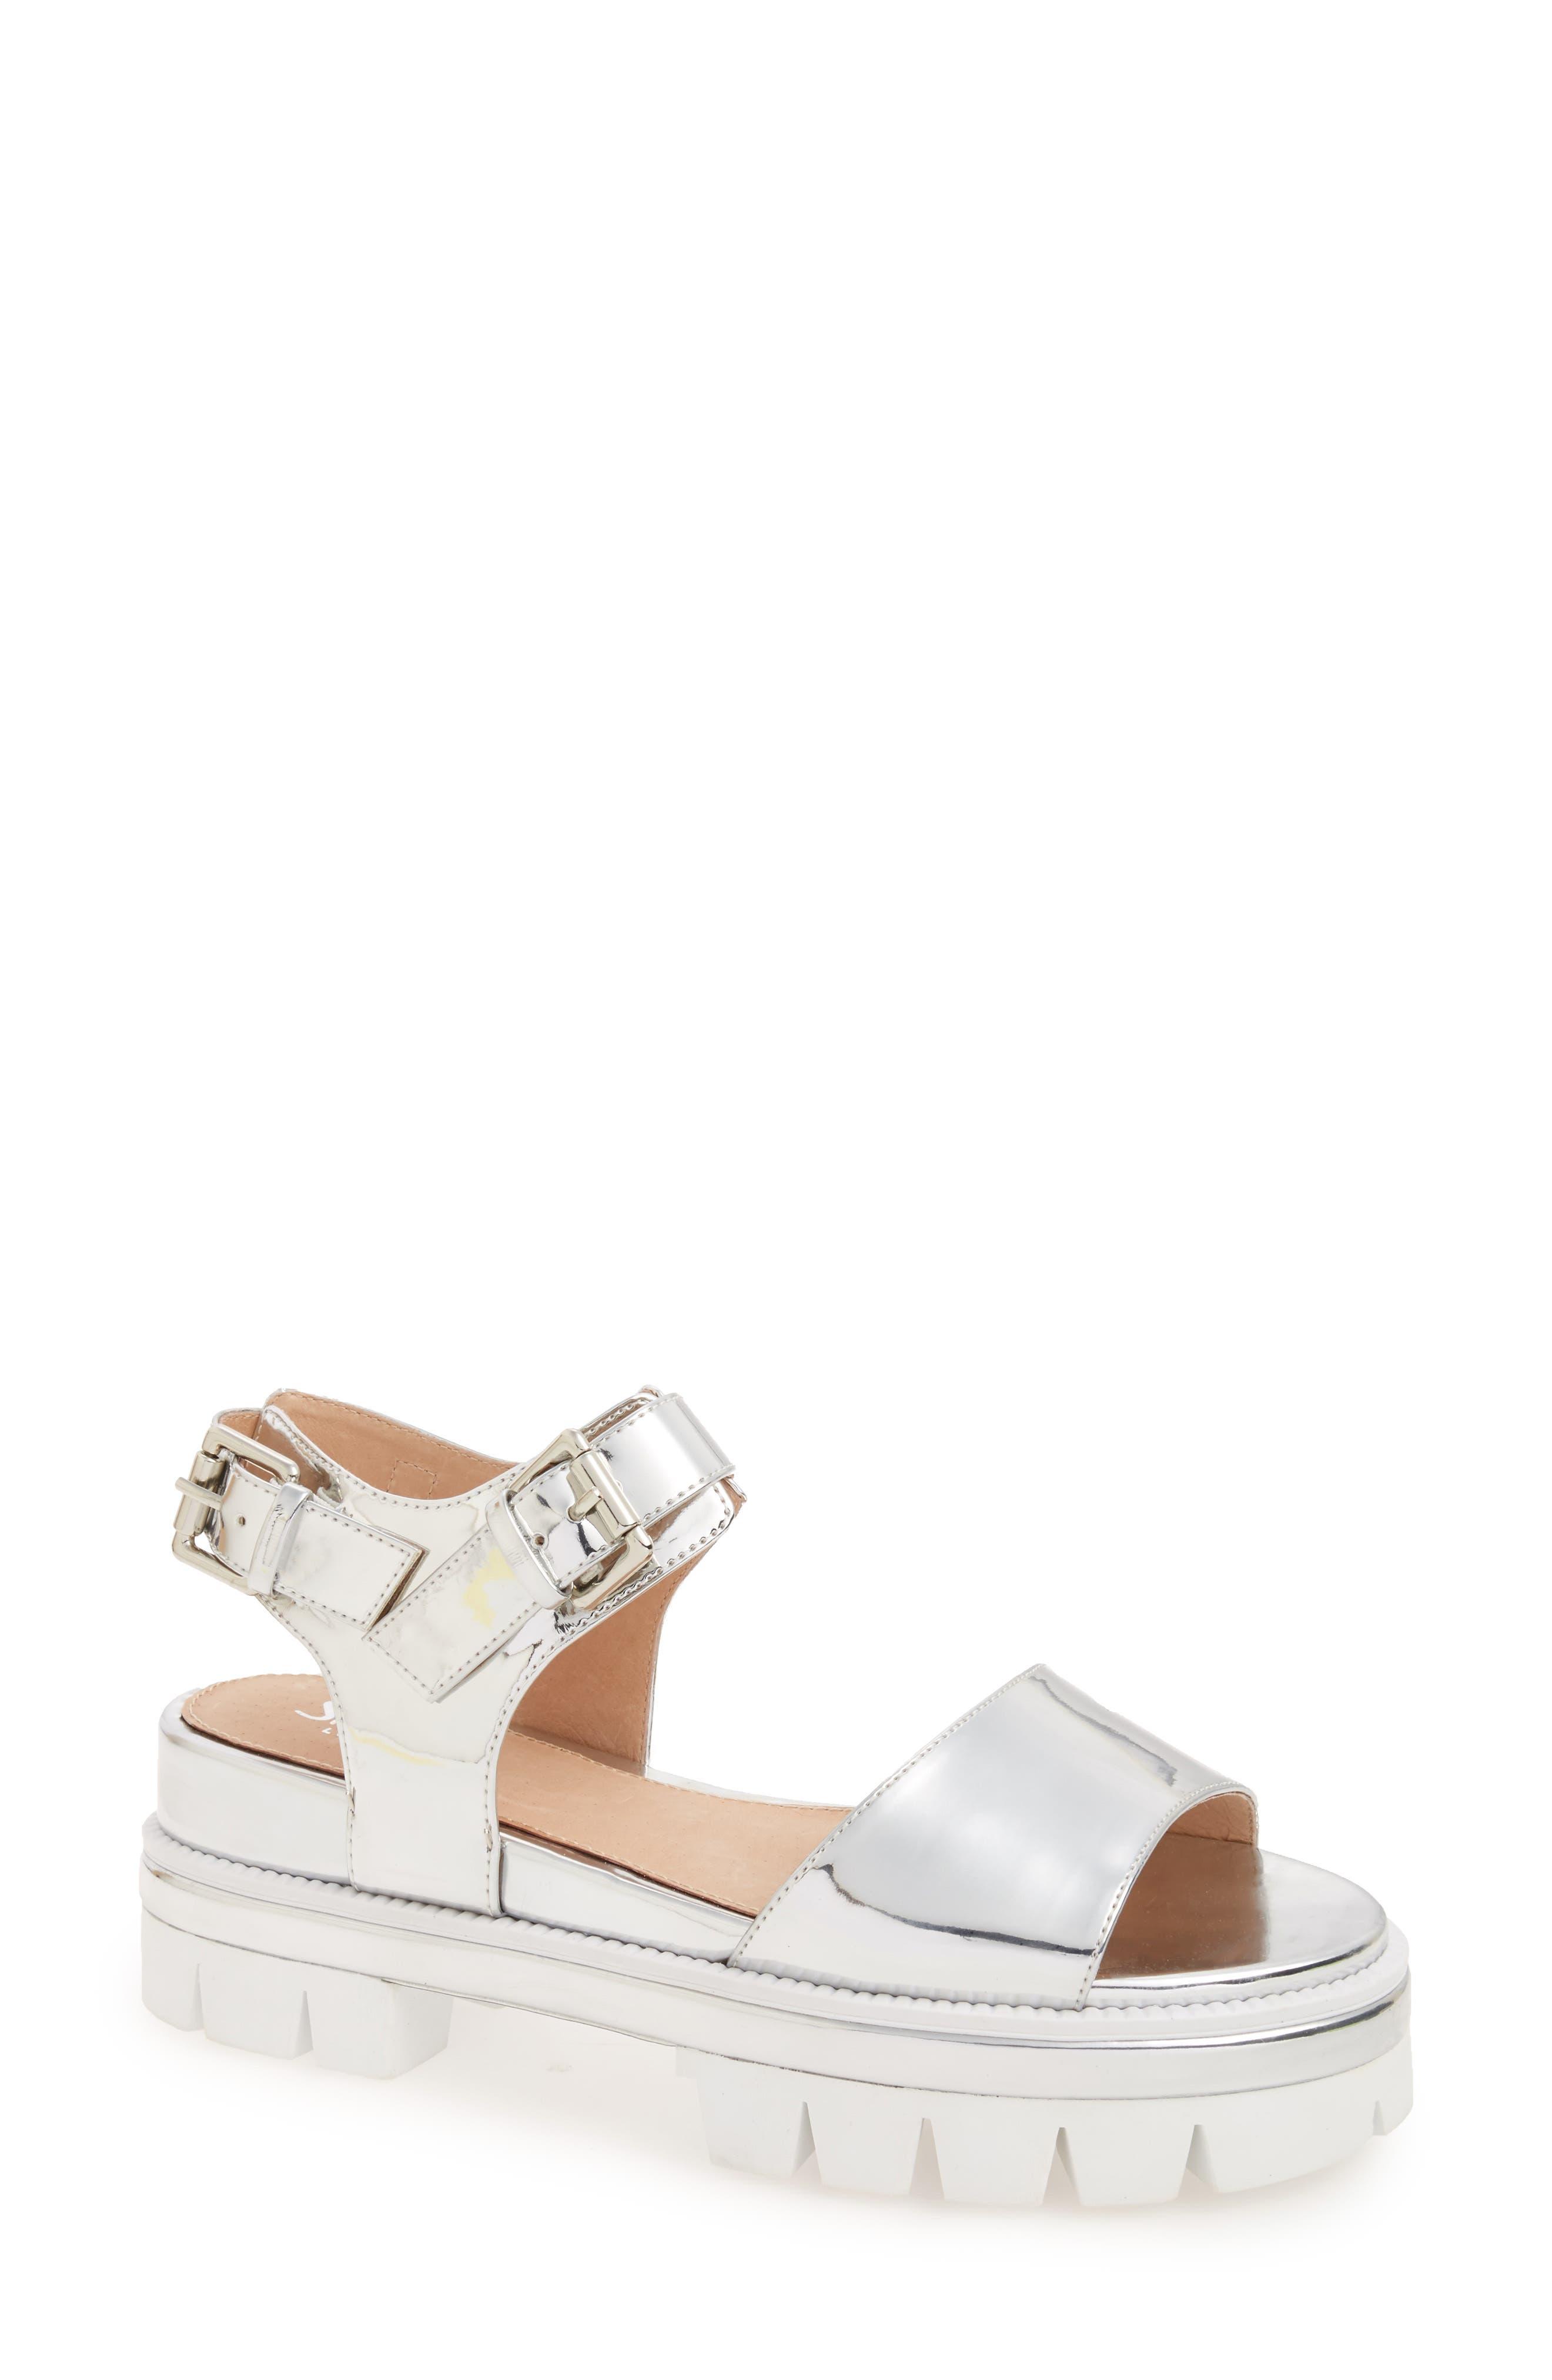 Alternate Image 1 Selected - Shellys London Dita Platform Sandal (Women)